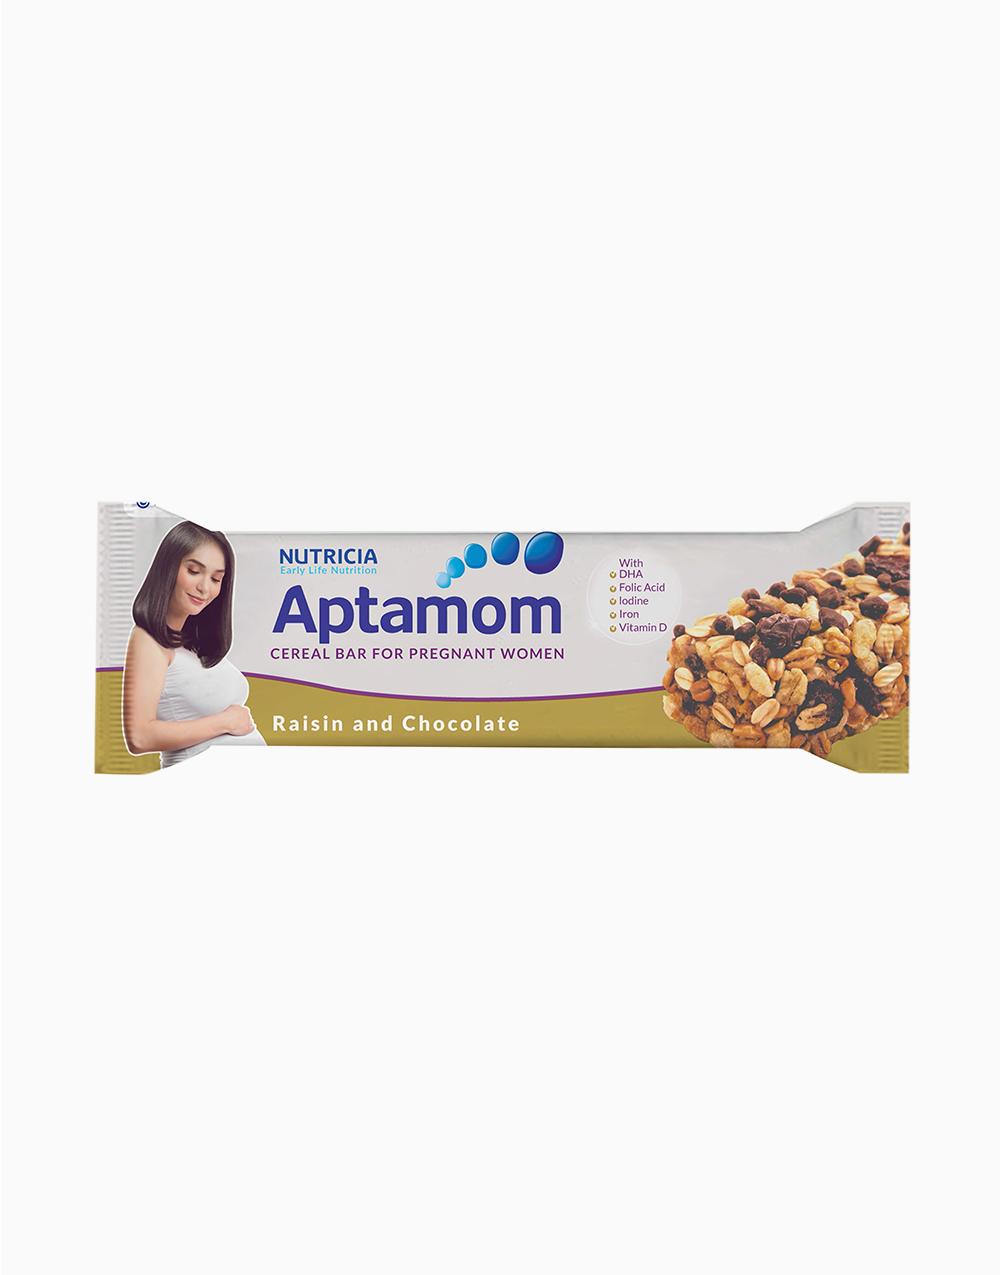 Aptamom Cereal Bar - Raisin and Chocolate with DHA (40g) by Nutricia